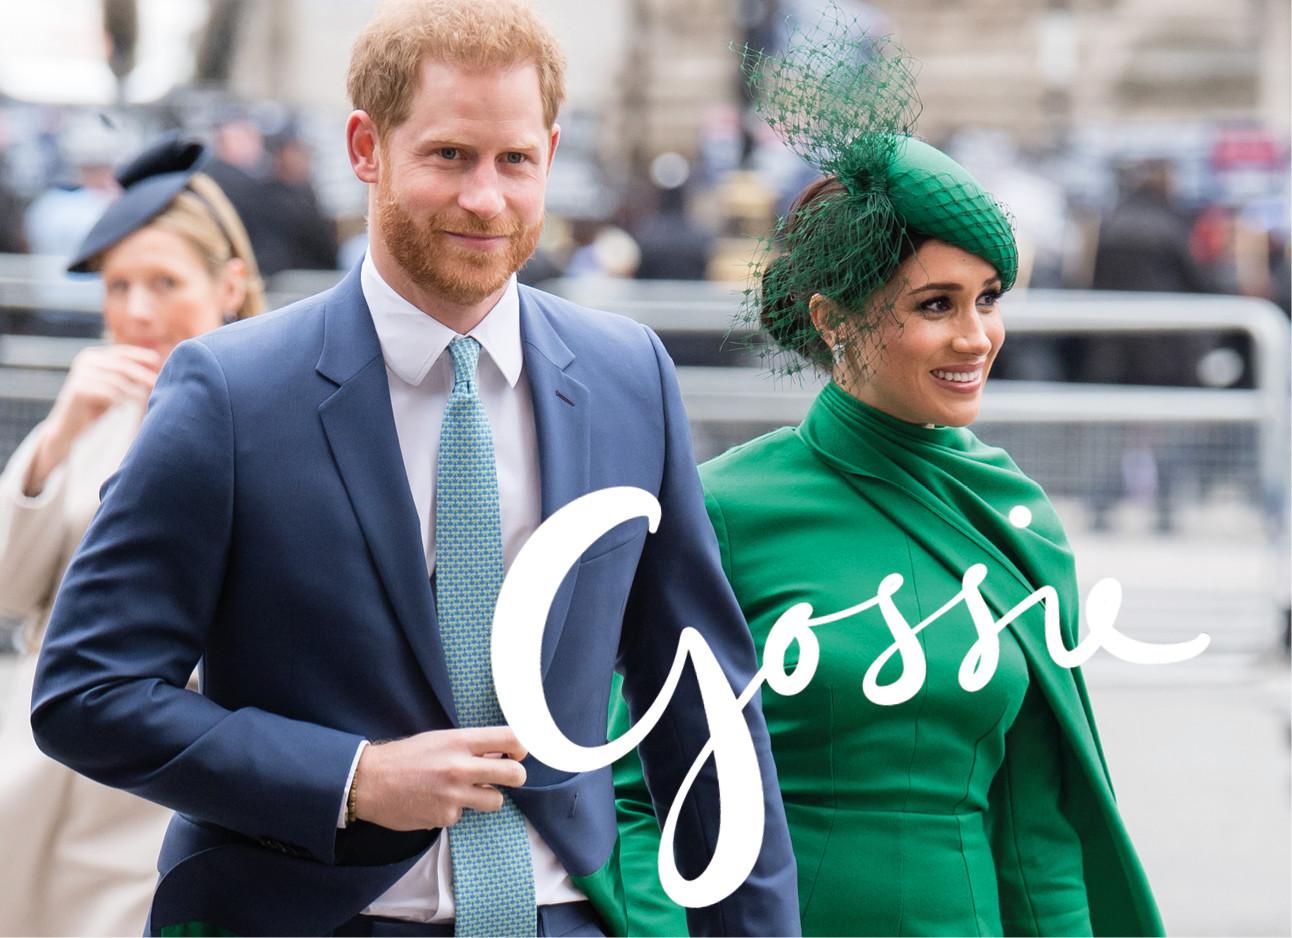 Meghan markle en prins harry lopend over straat in groene outfit